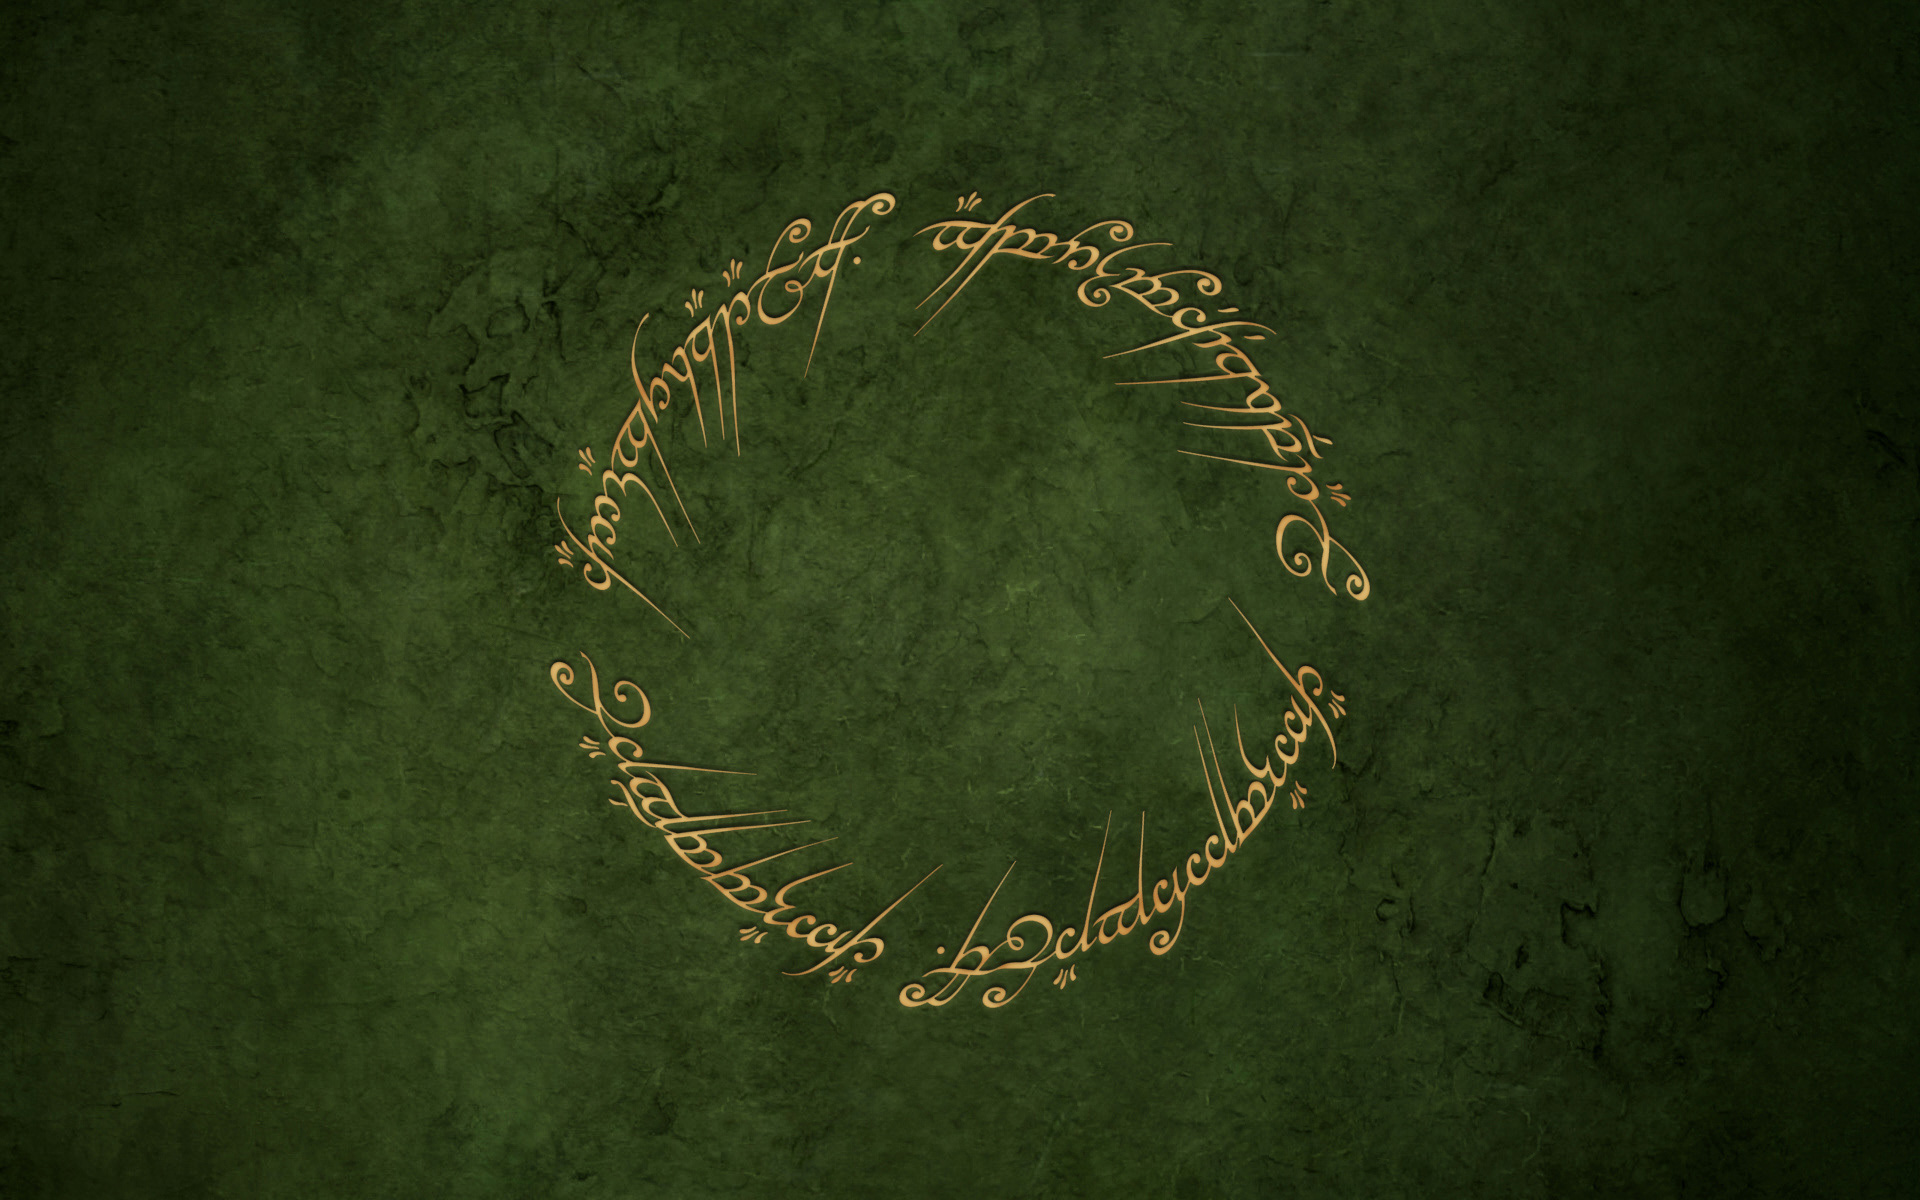 Lord Of The Rings HD Wall by Paul Emmeth on FeelGrafix 1920x1200